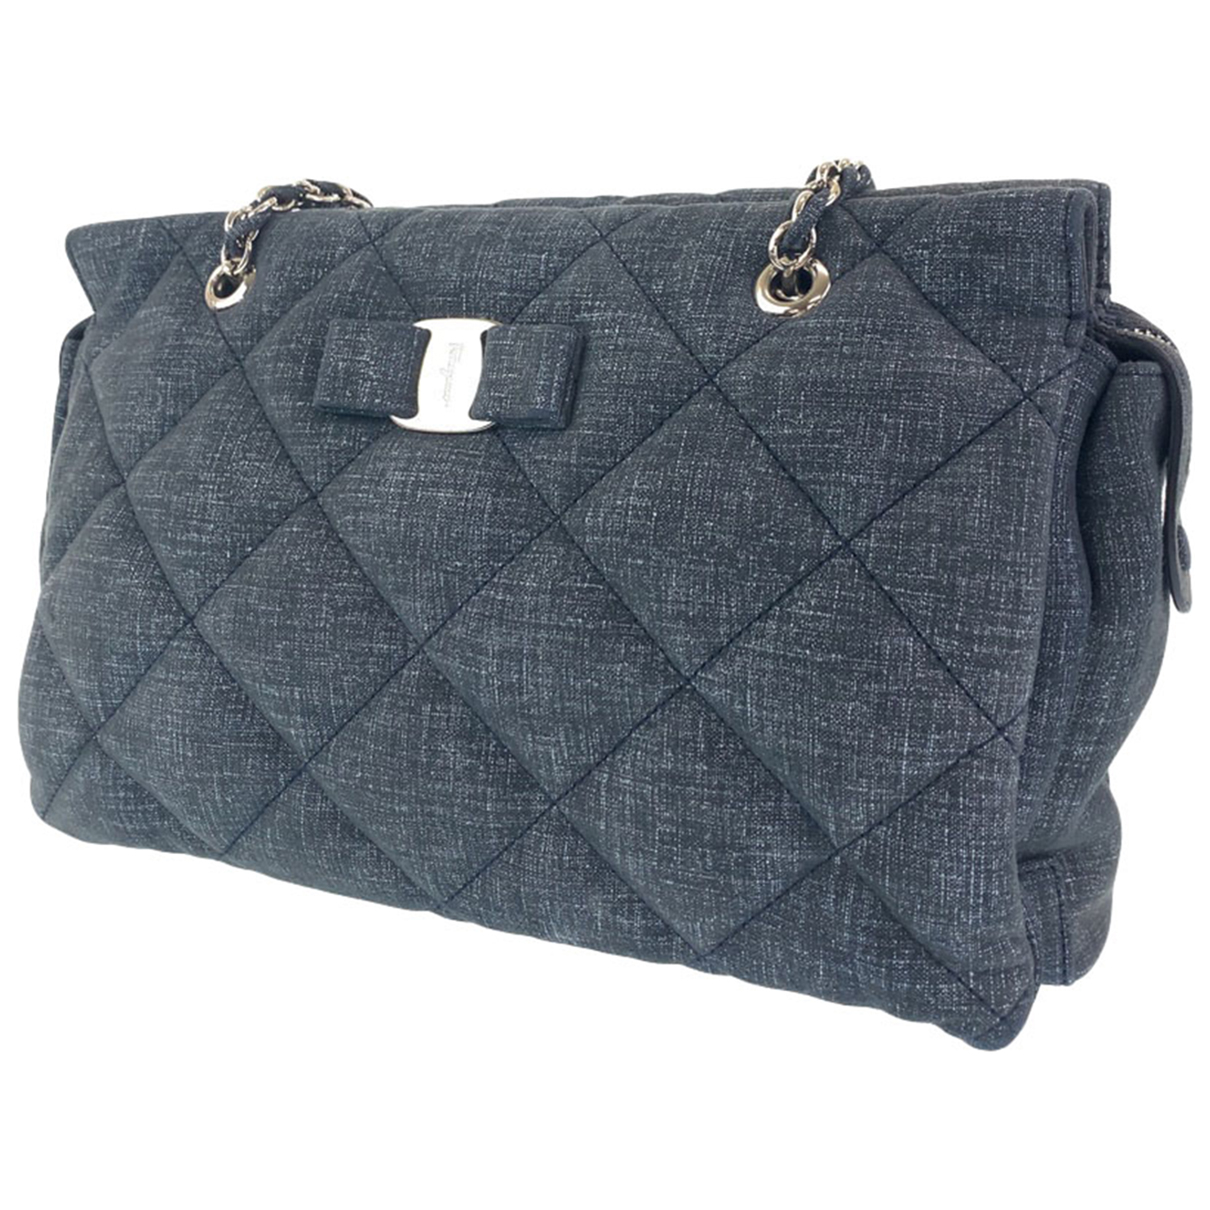 Salvatore Ferragamo \N Grey Cotton handbag for Women \N